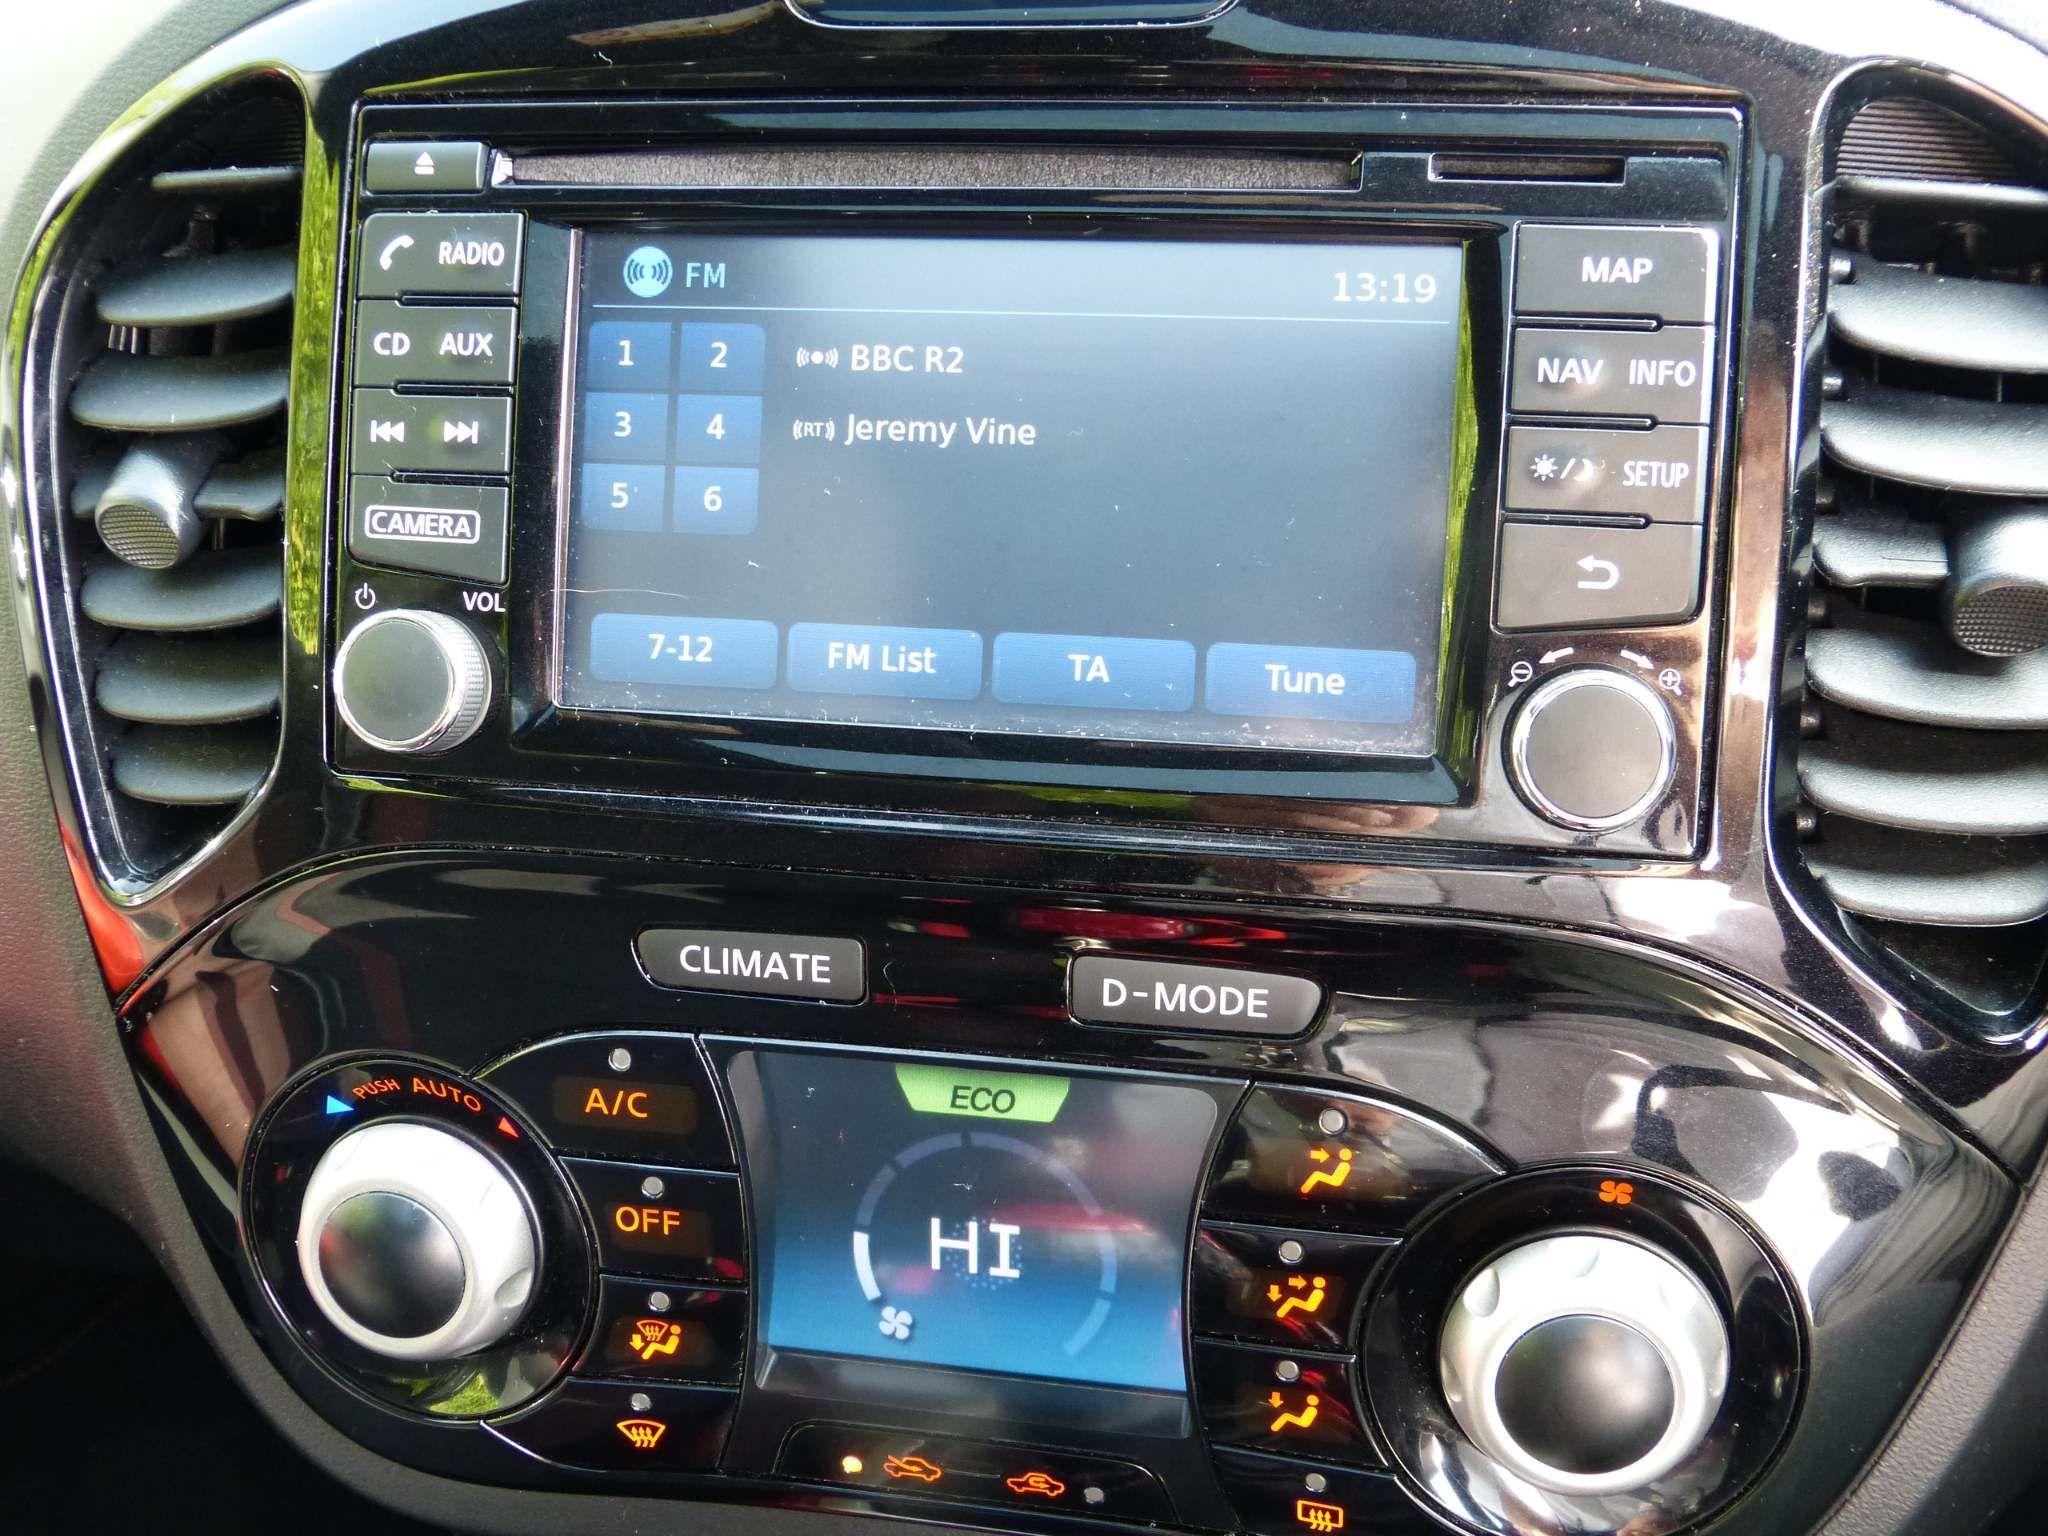 2014 NISSAN Juke 1.2 DIG-T Acenta Premium Manual 6Spd (s/s) Petrol Manual electric glass sunroof – Beechlawn Motors Belfast full